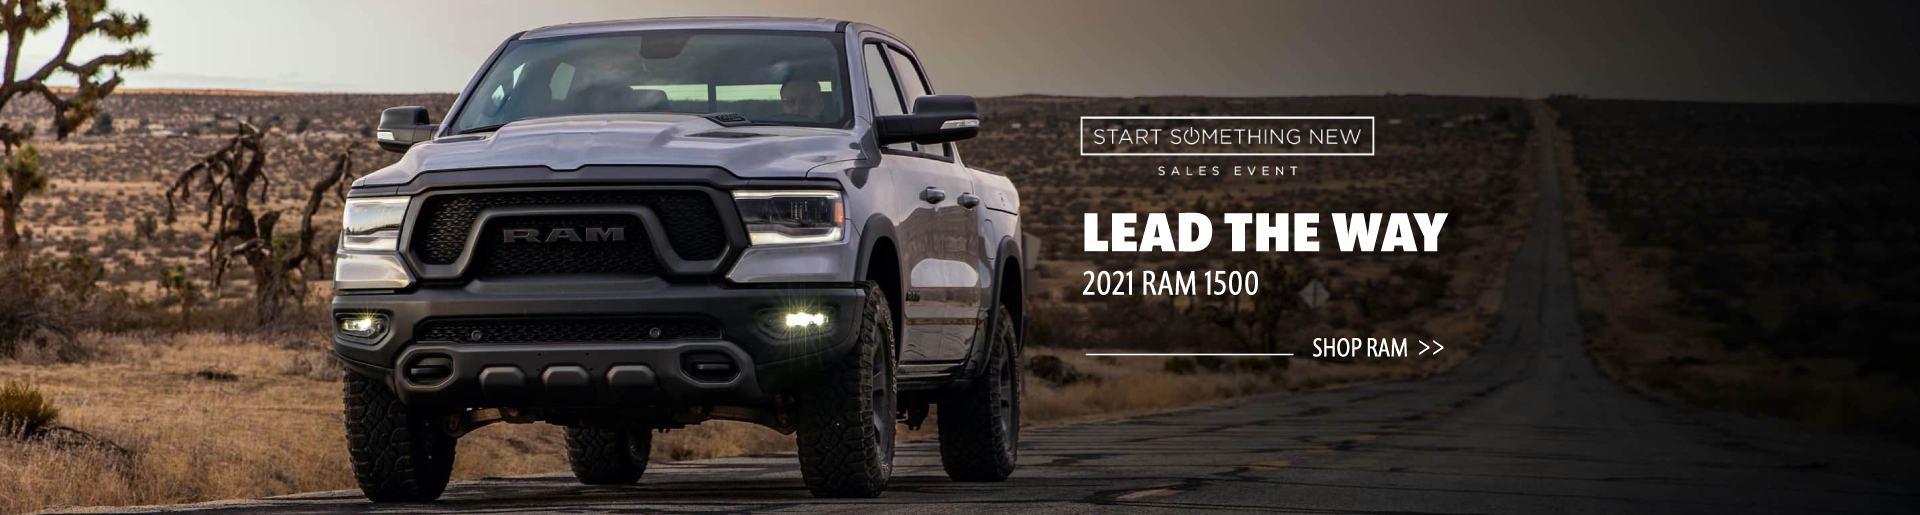 2021 Ram 1500 Generic- January 2021